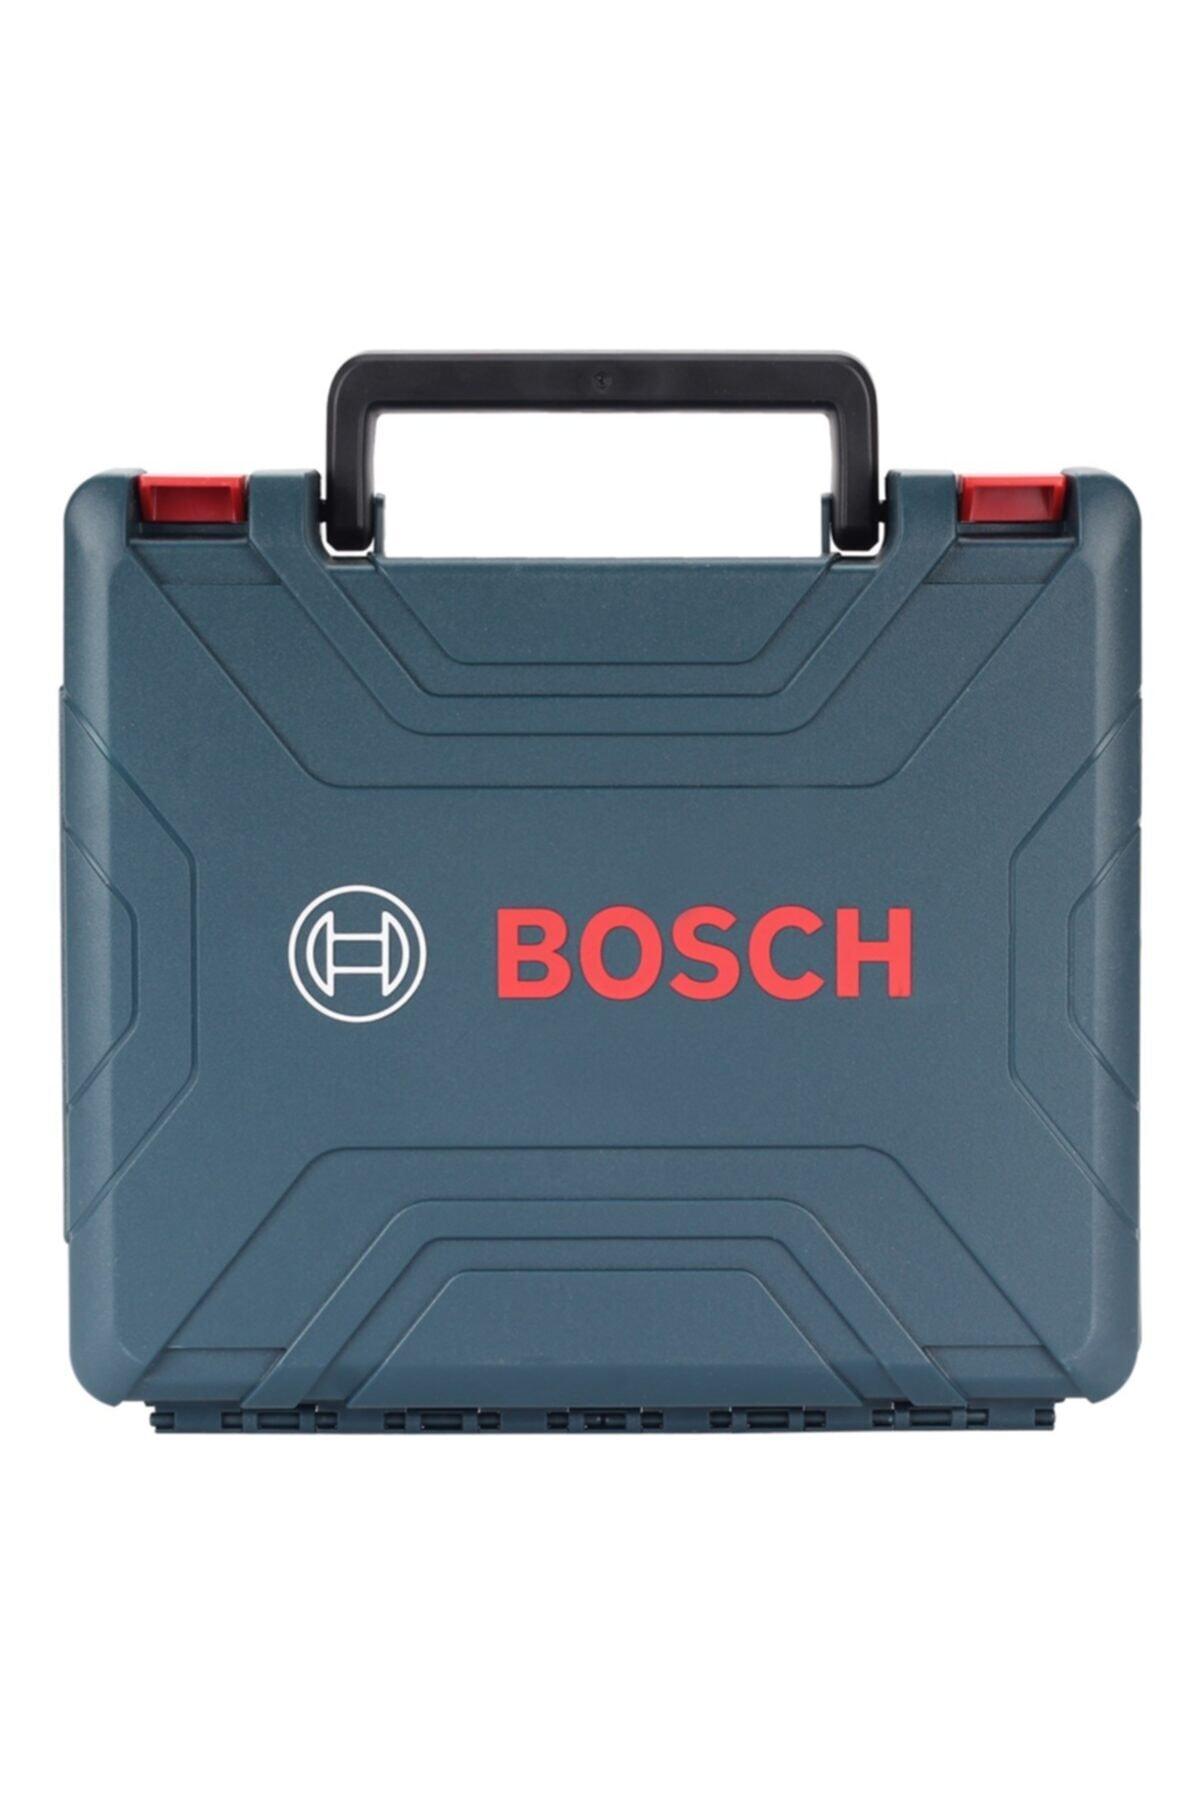 Bosch Gsb 120-lı 2 Ah Çift Akülü Darbeli Delme Vidalama - 06019g8102